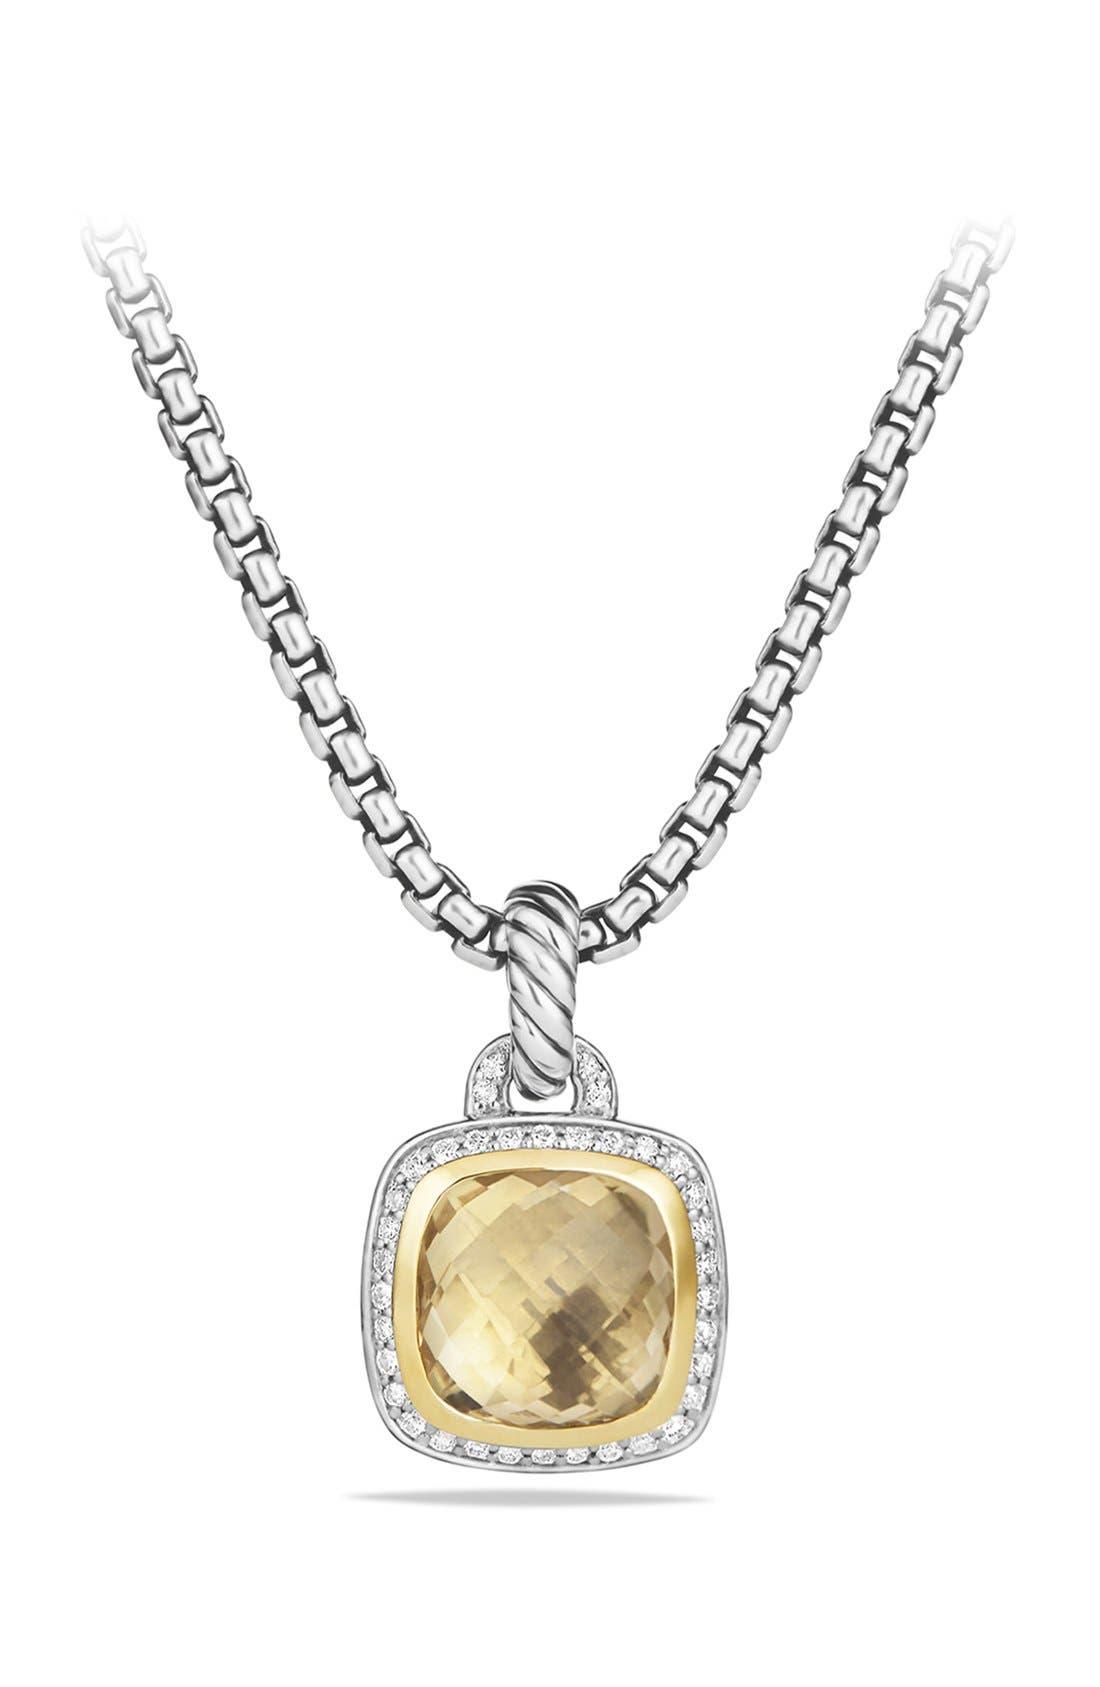 Alternate Image 1 Selected - David Yurman'Albion' Pendant with Diamonds and 18K Gold